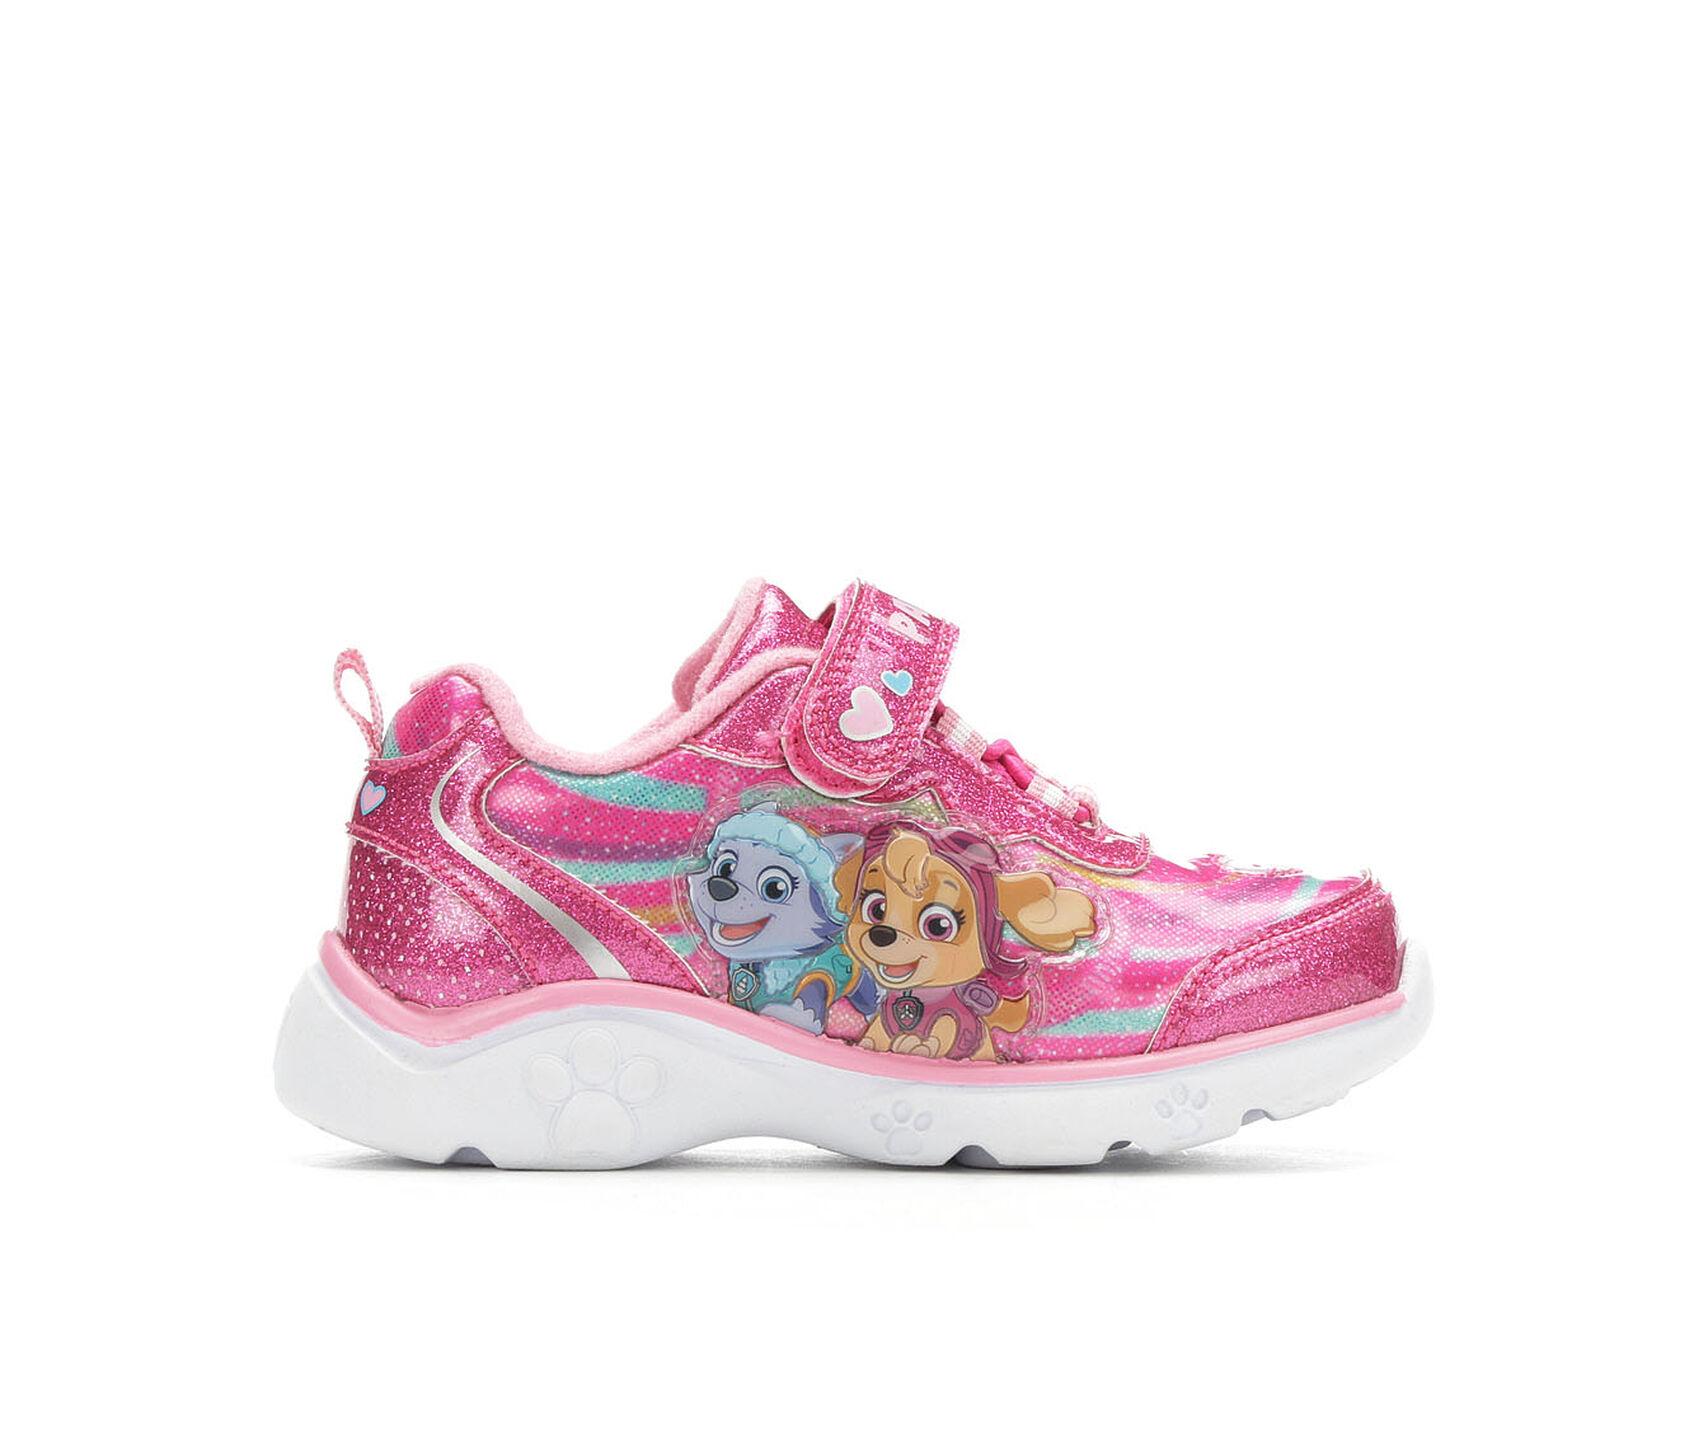 eabba5ba1d17 Girls  Nickelodeon Toddler   Little Kid Paw Patrol 4 Light-Up Sneakers